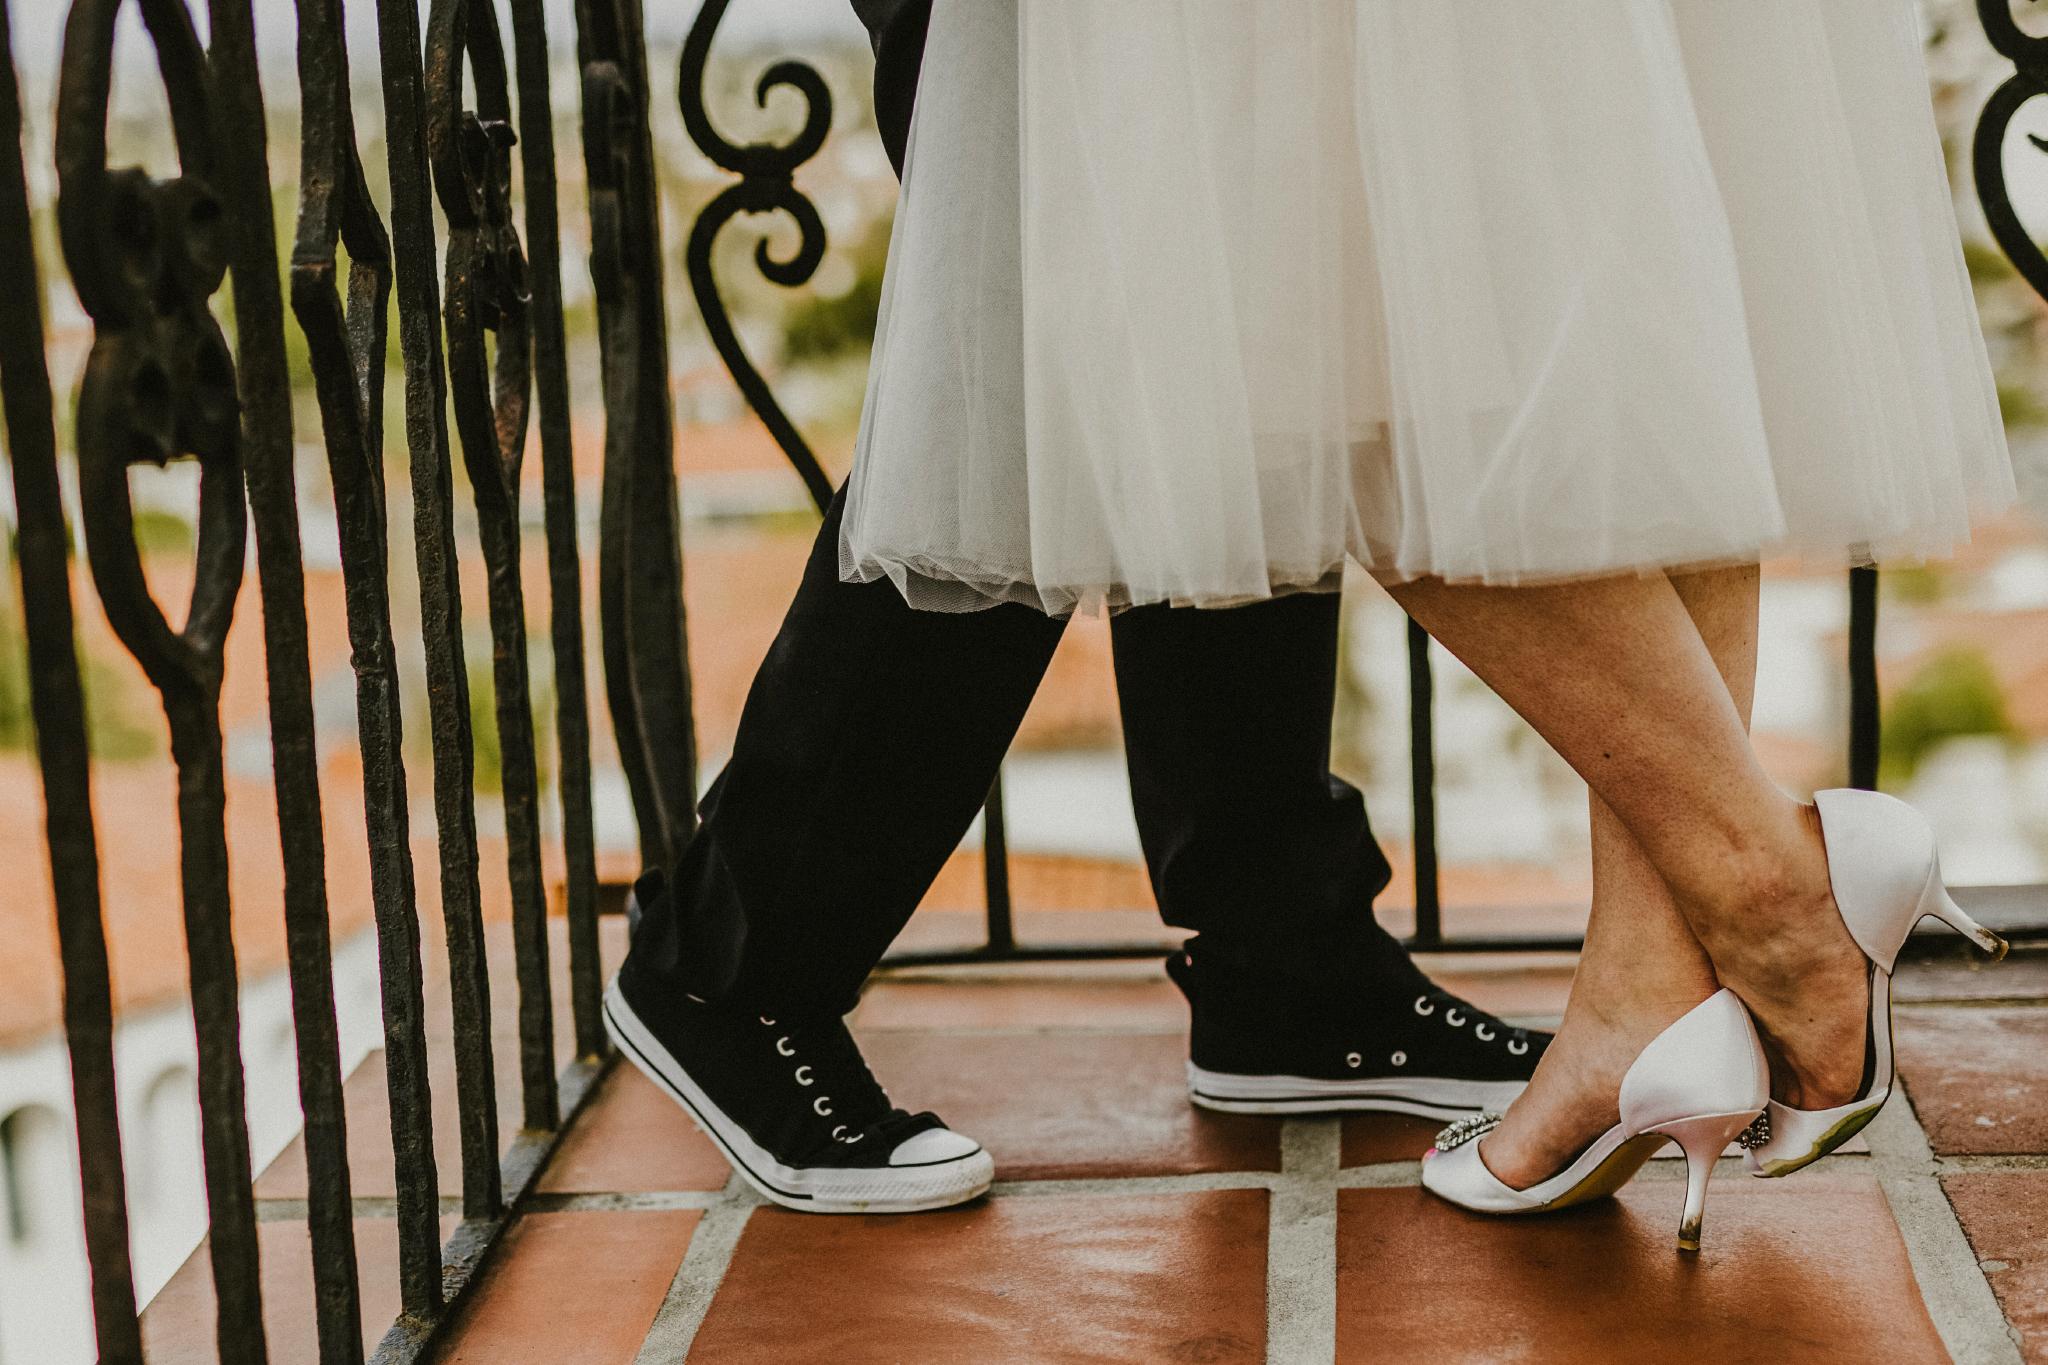 san diego wedding   photographer   feet of women near railing